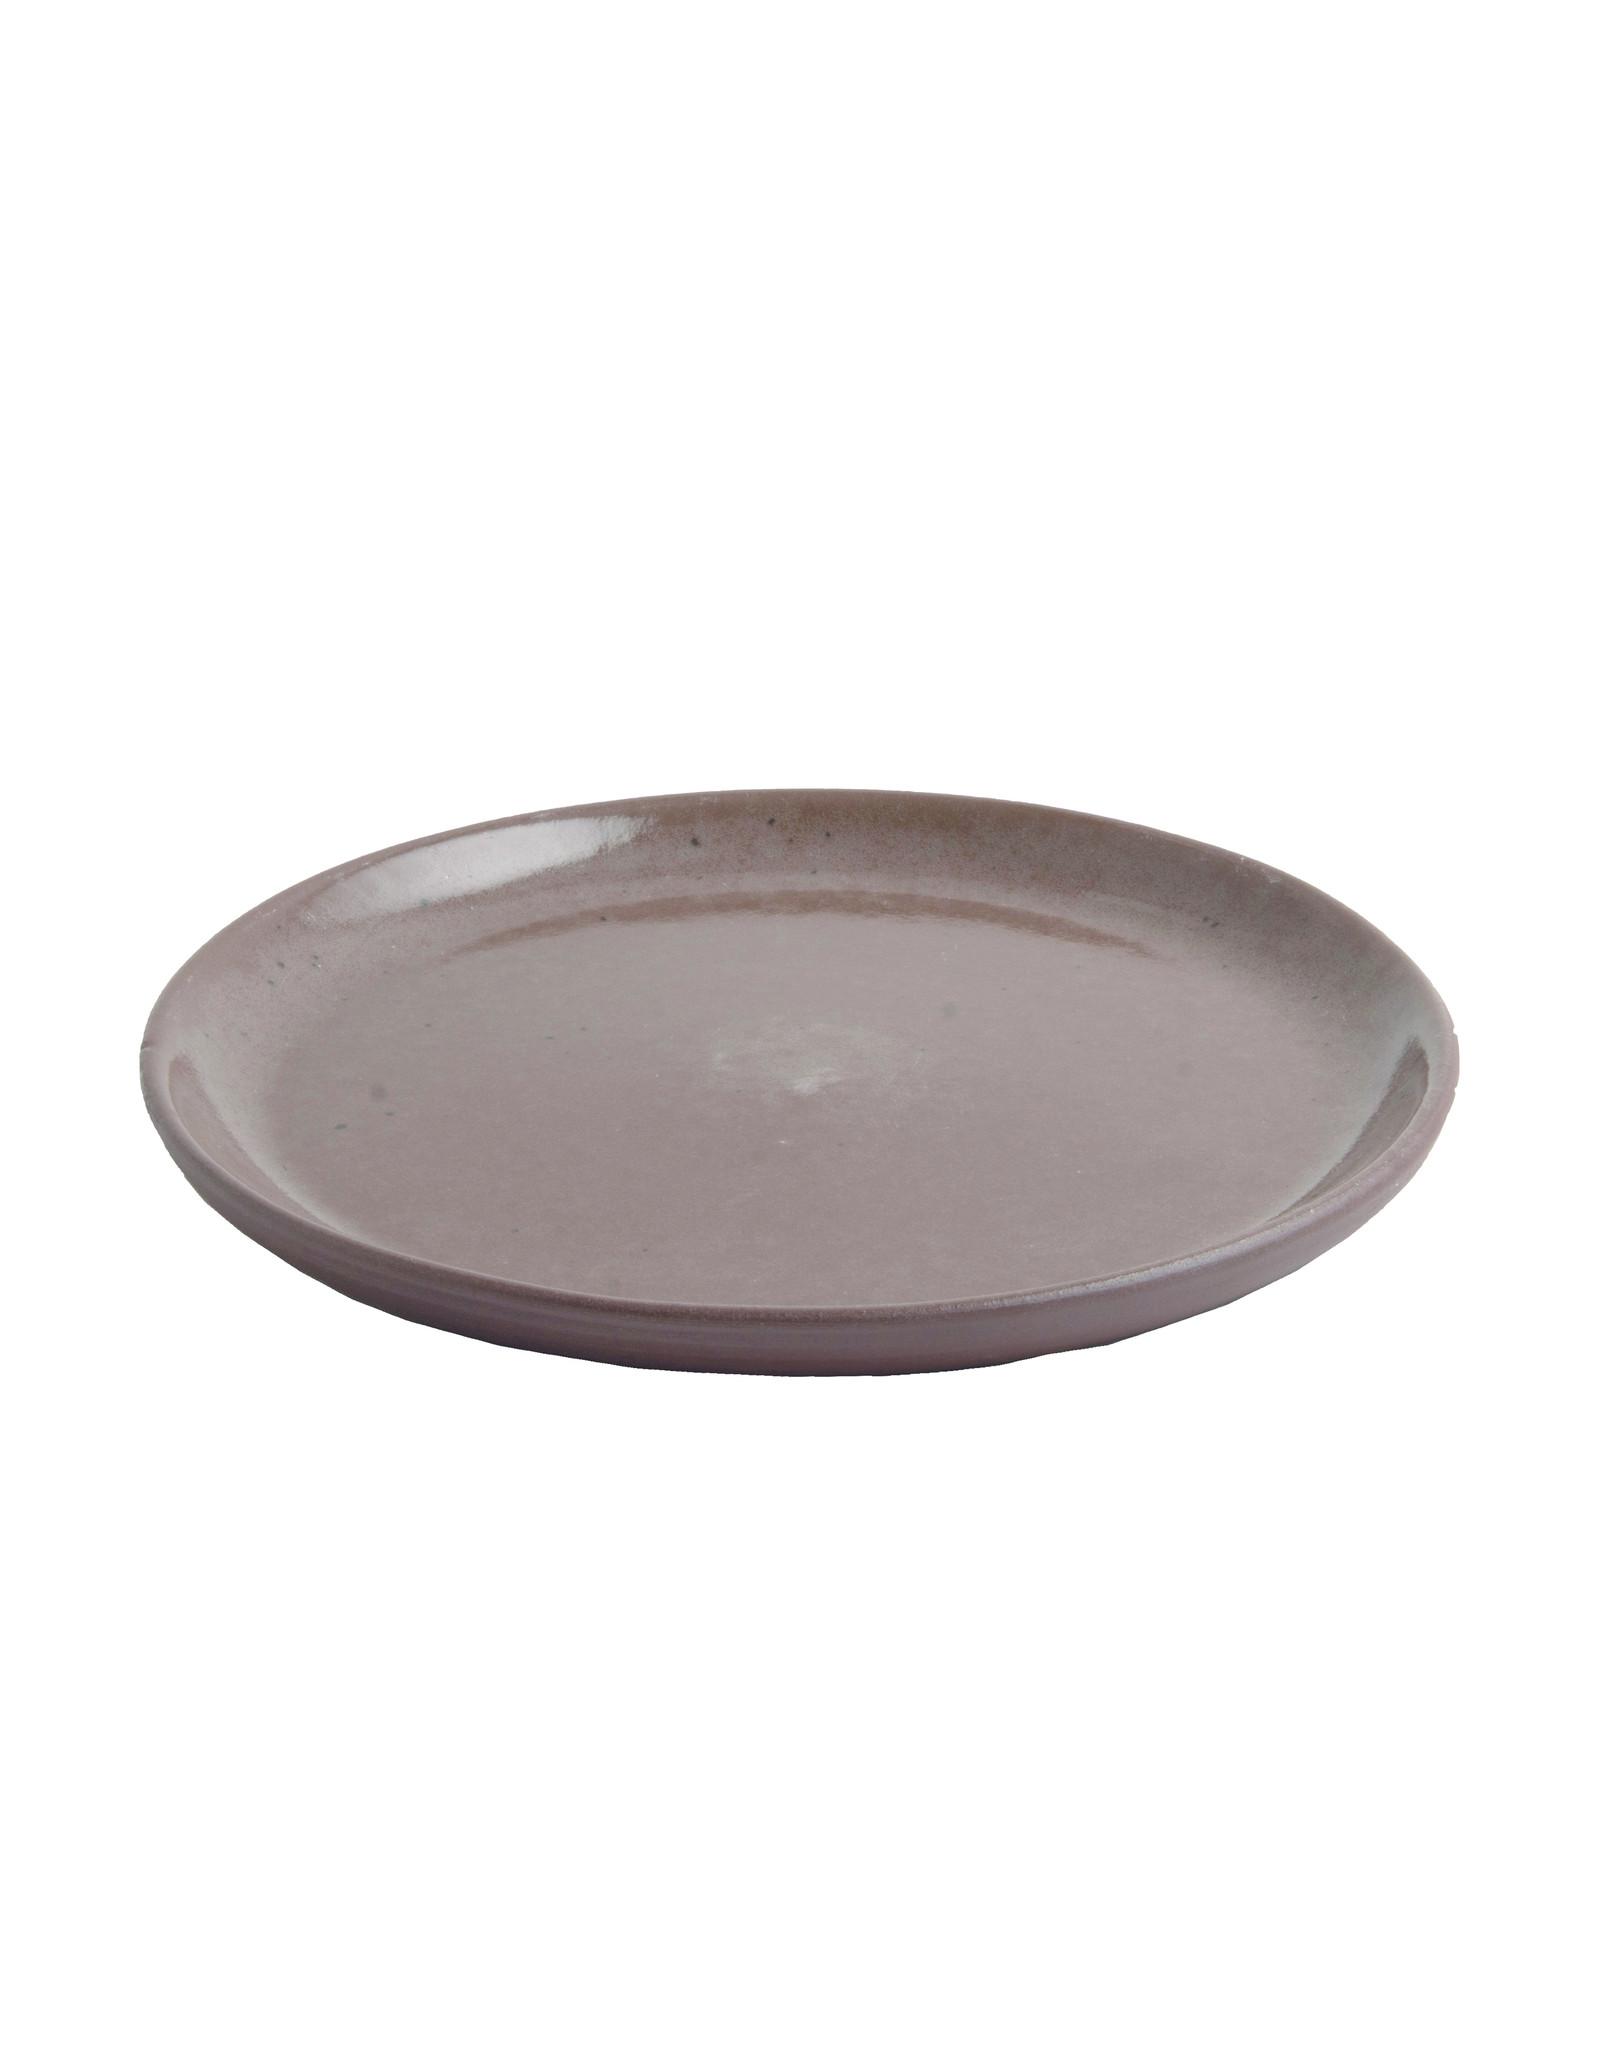 Yann plate M - Earth